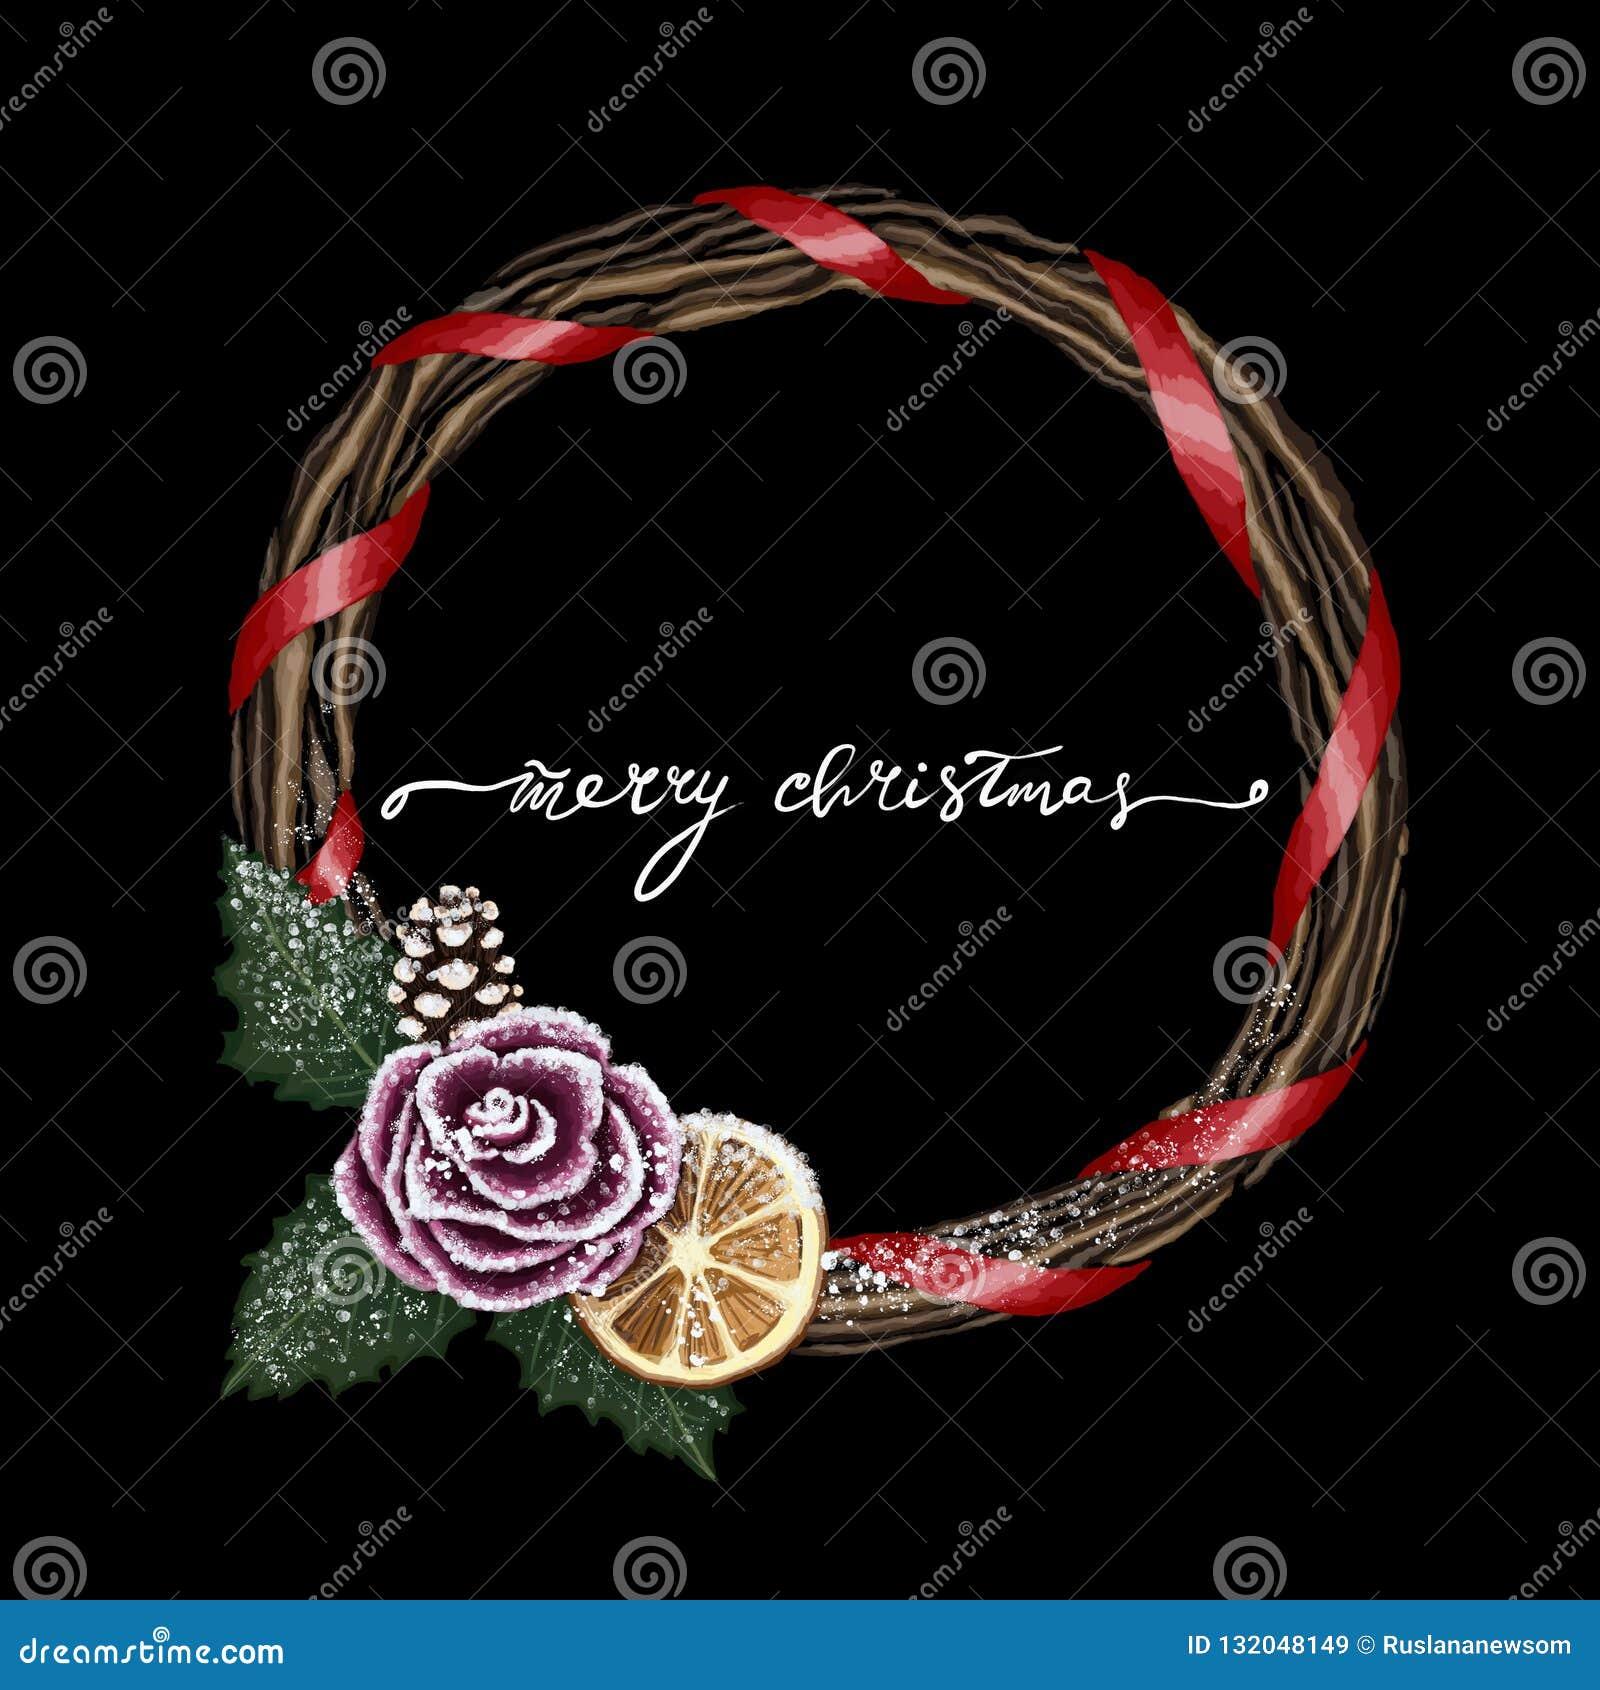 Black Dark Black Winter Merry Christmas Wreath Illustration With Festive Holiday Wreath Merry Christmas Lettering Stock Image Illustration Of Green Festive 132048149